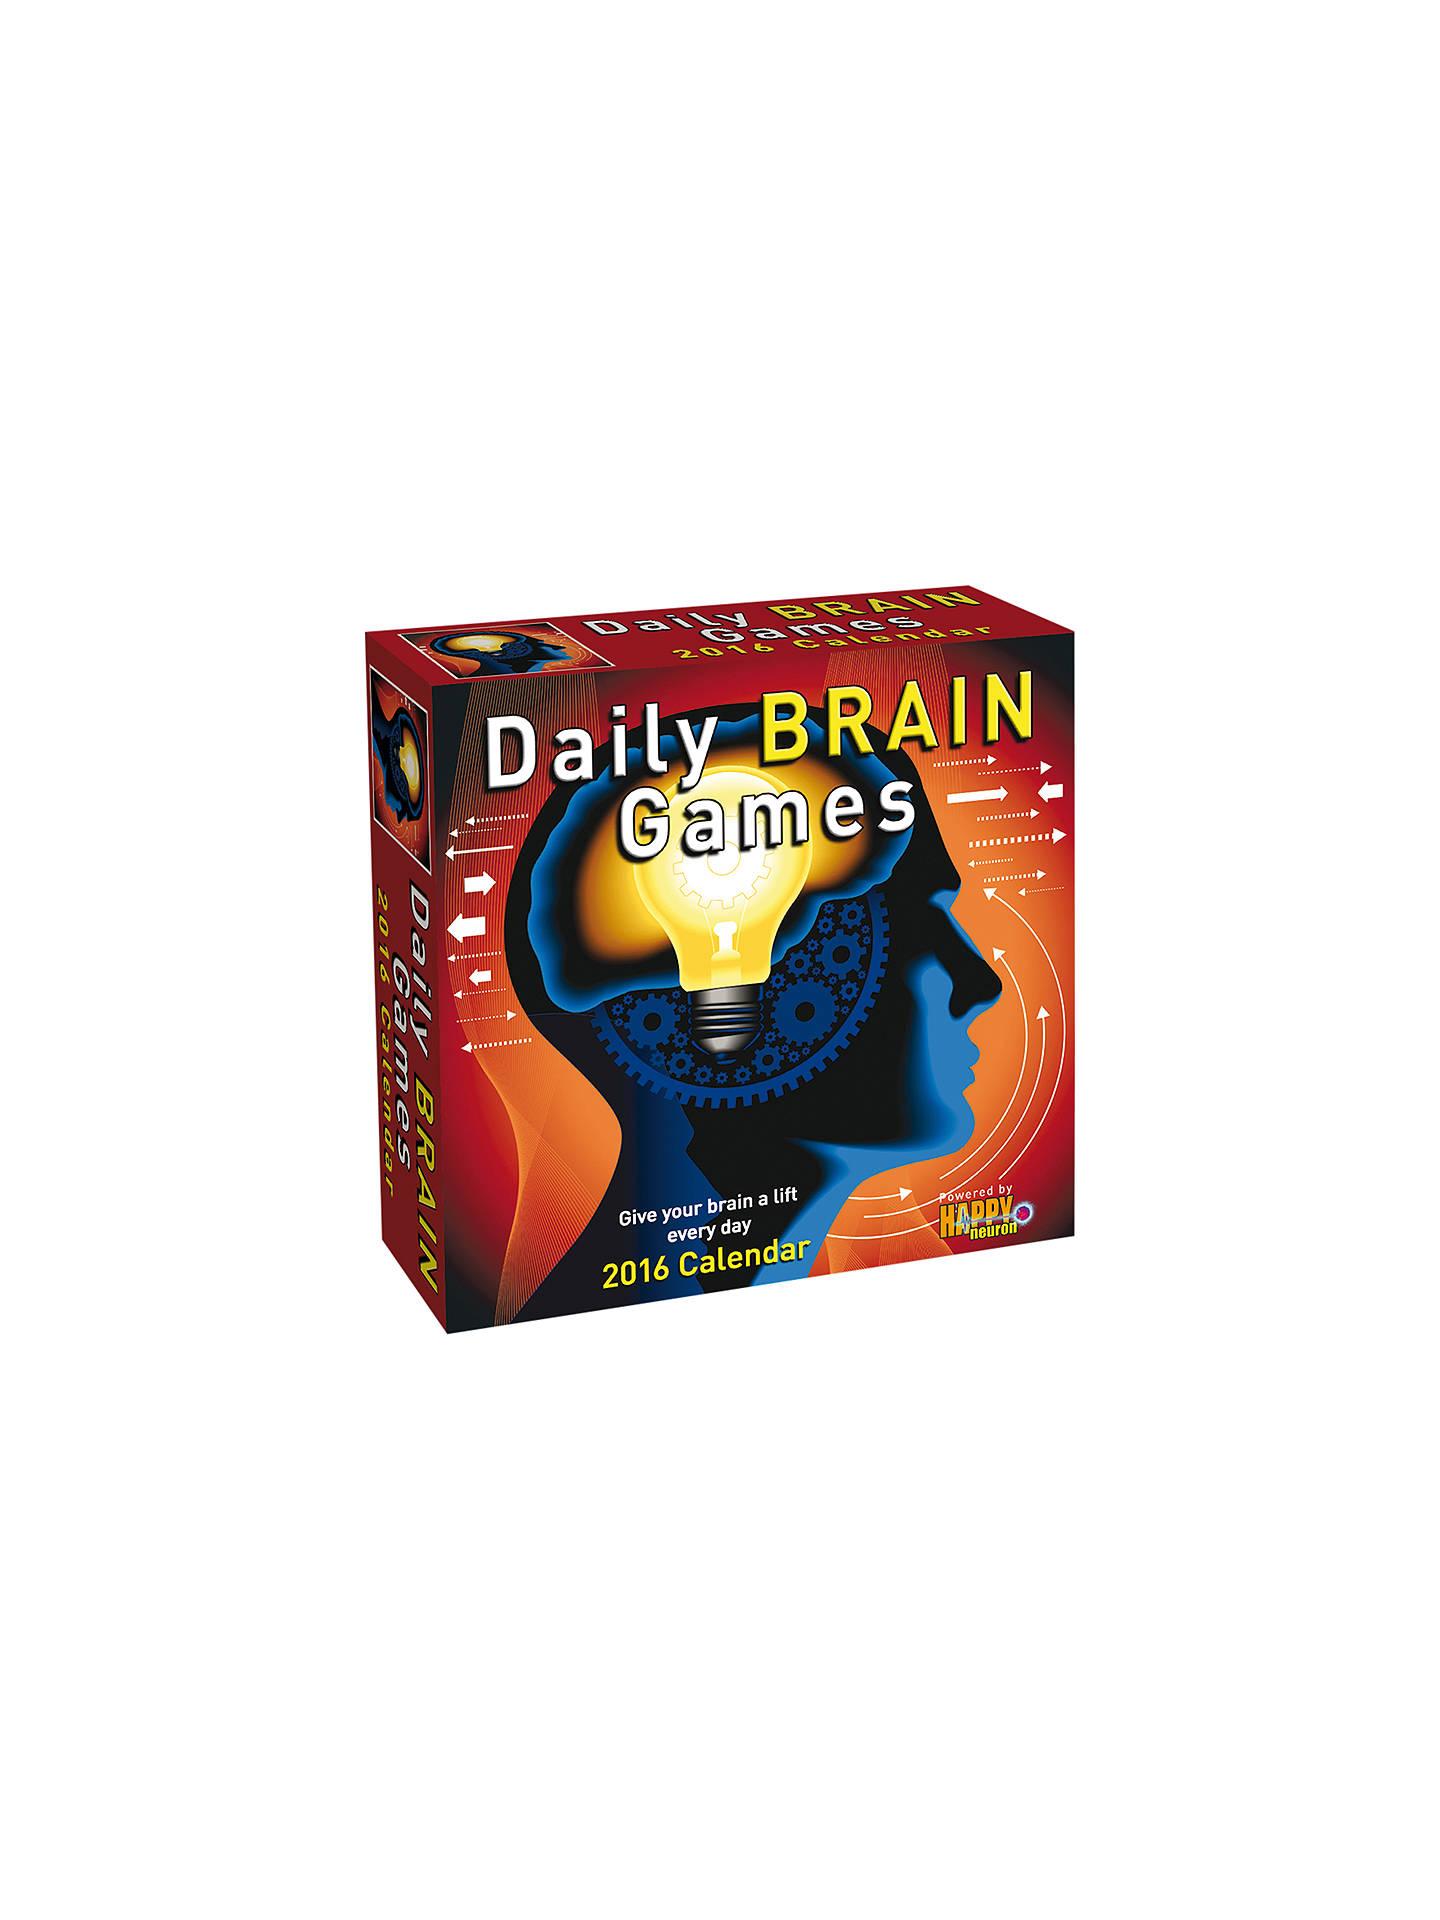 Daily Brain Games